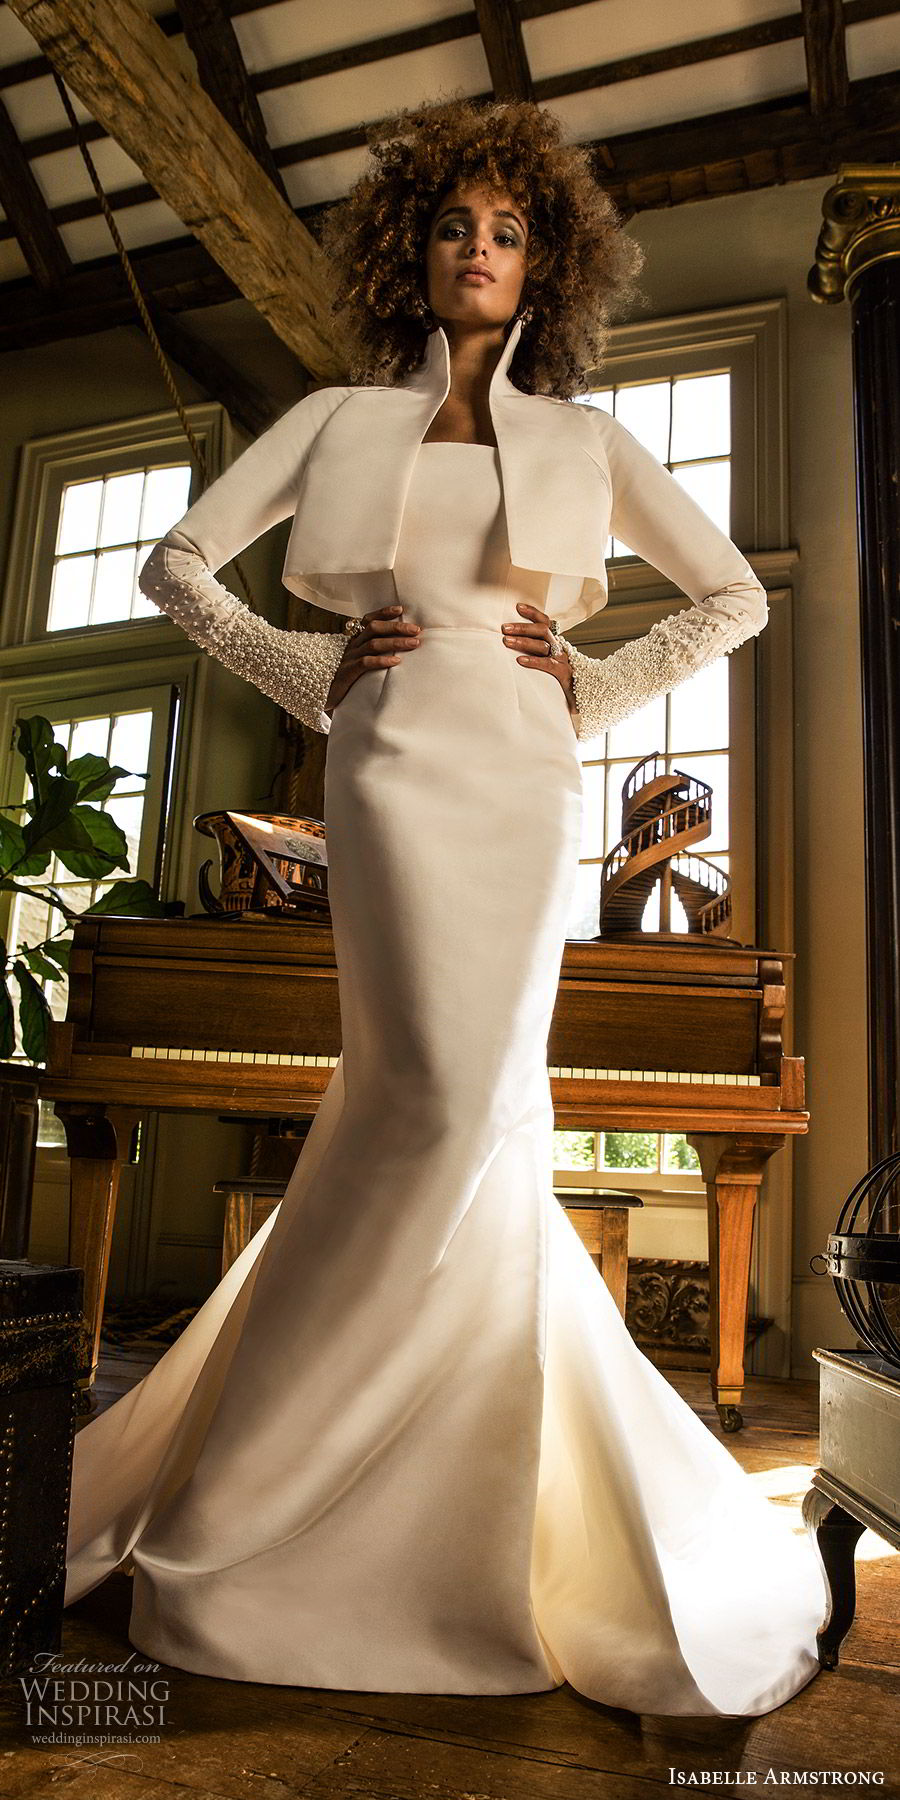 isabelle armstrong fall 2019 bridal long sleeves jacket high collar mermaid wedding dress (4) clean modern chic mv